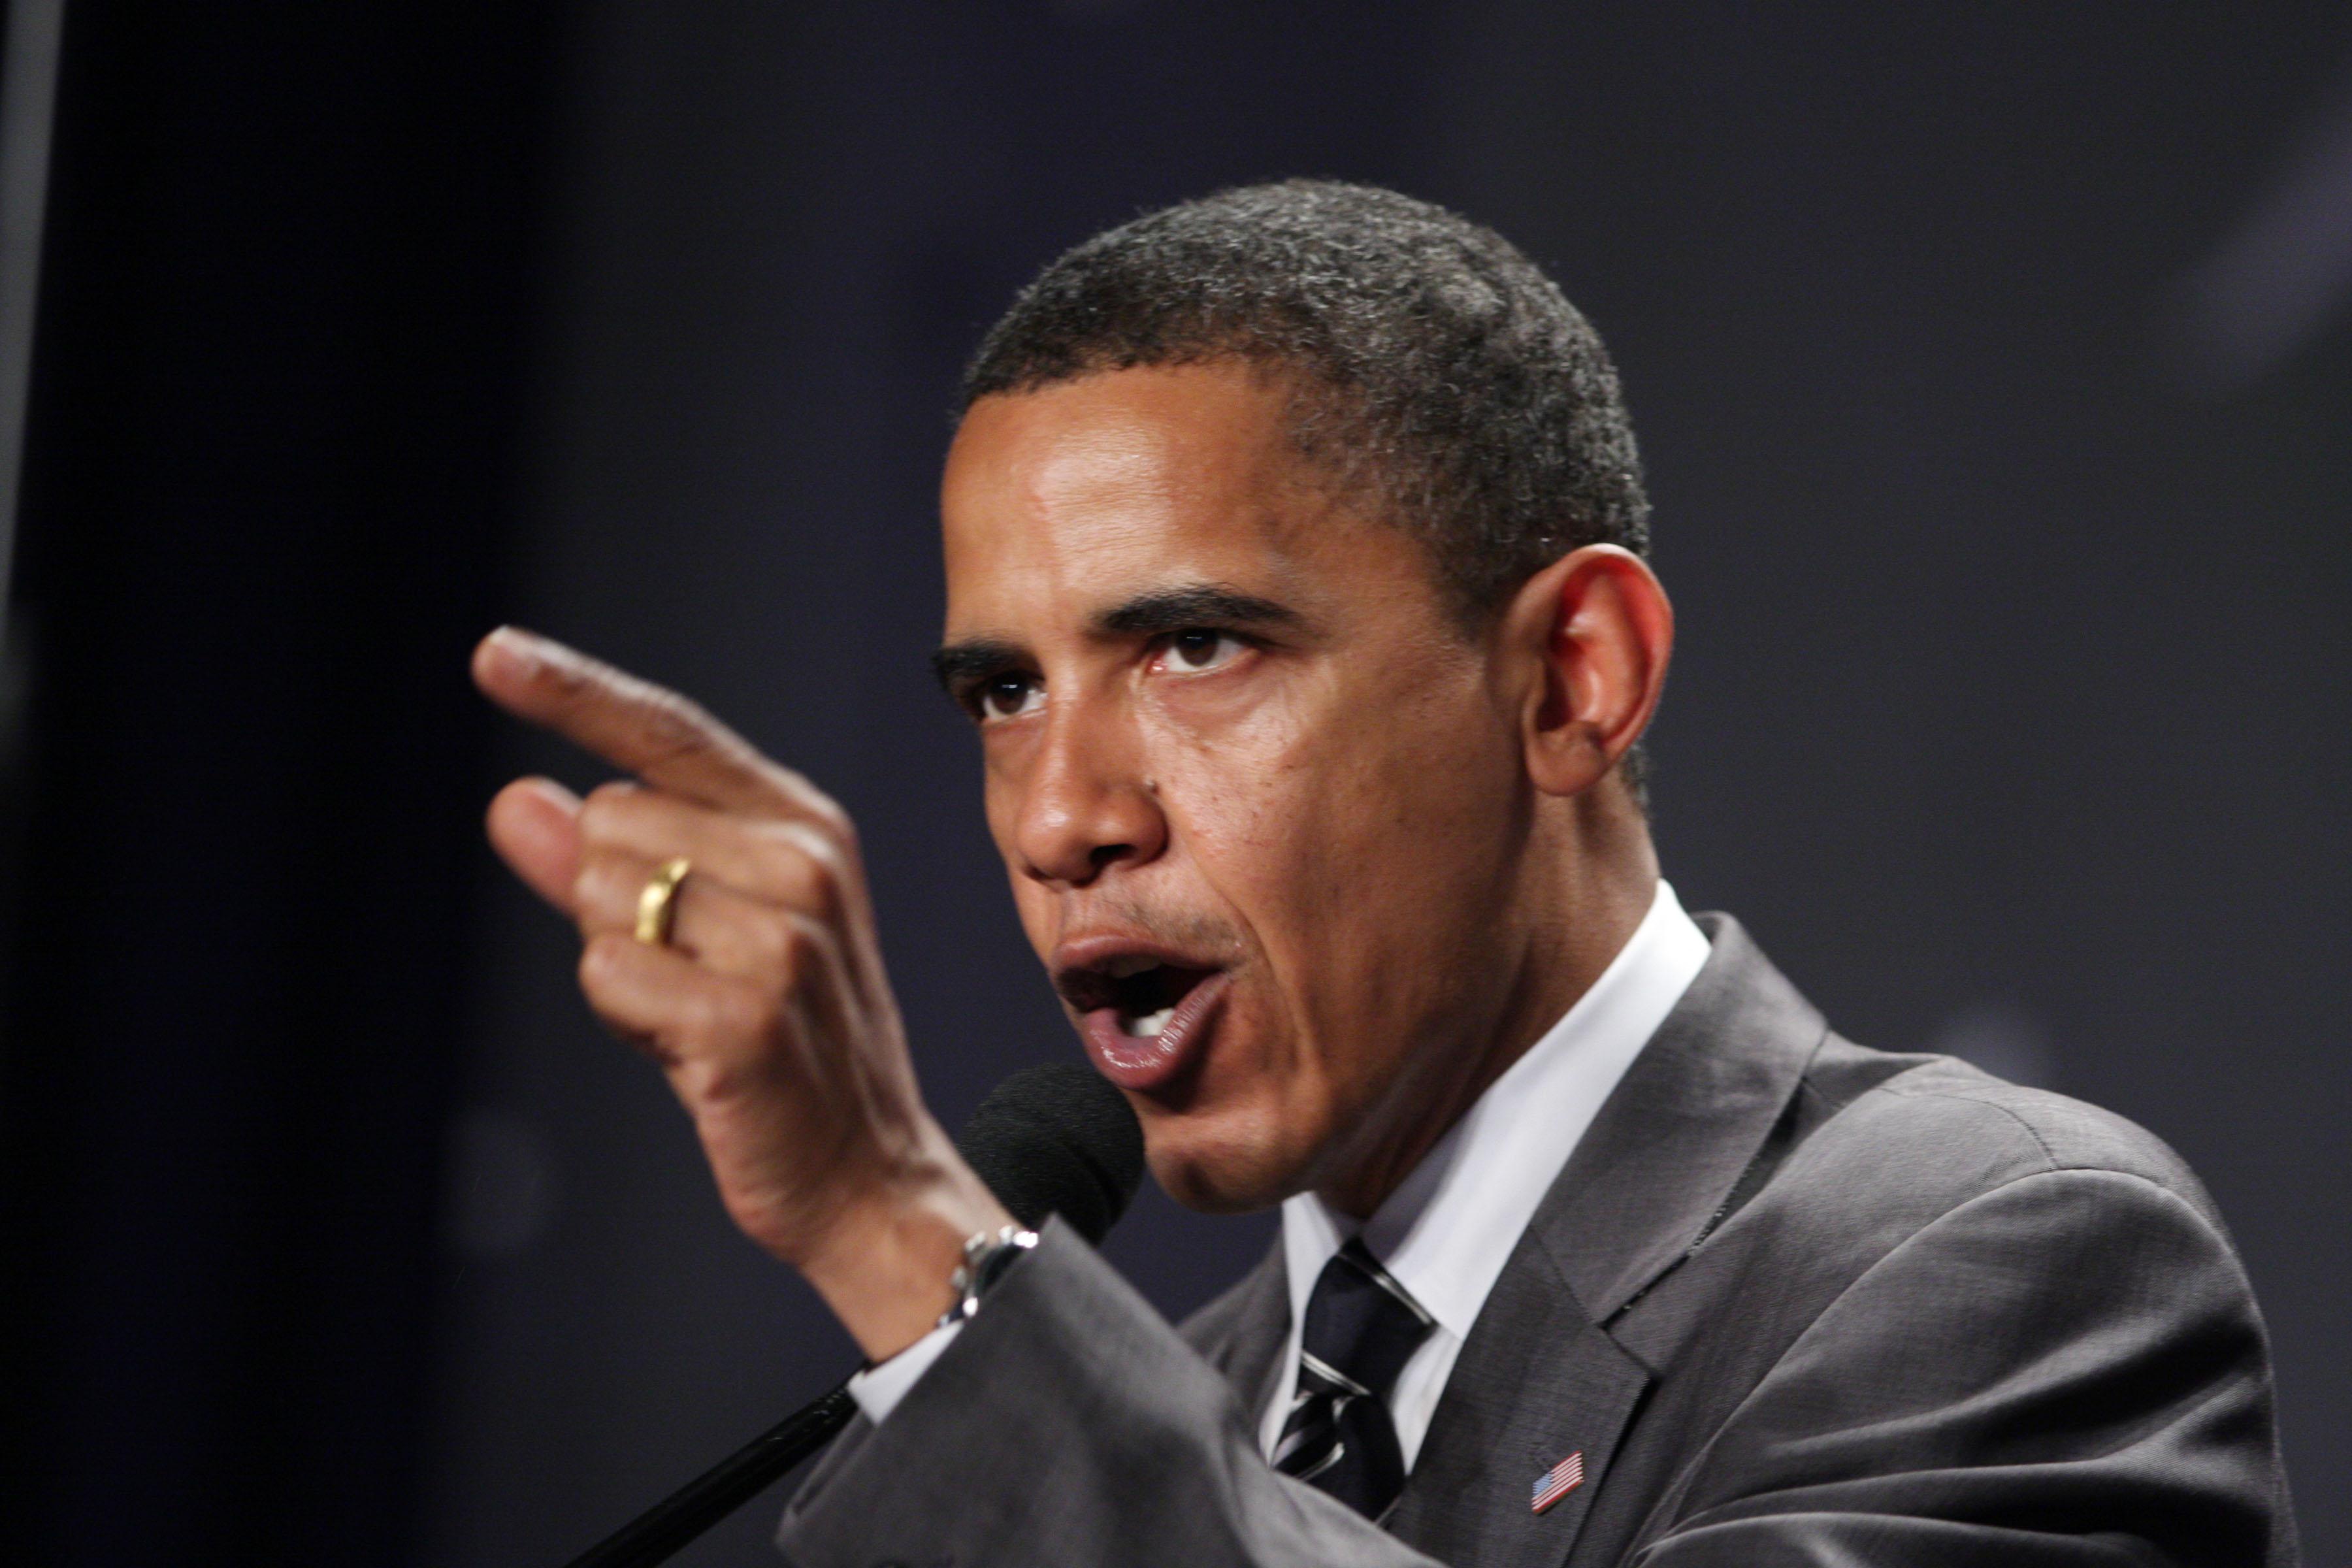 Obama advierte de nuevas sanciones a Rusia si incumple acuerdo de Ginebra